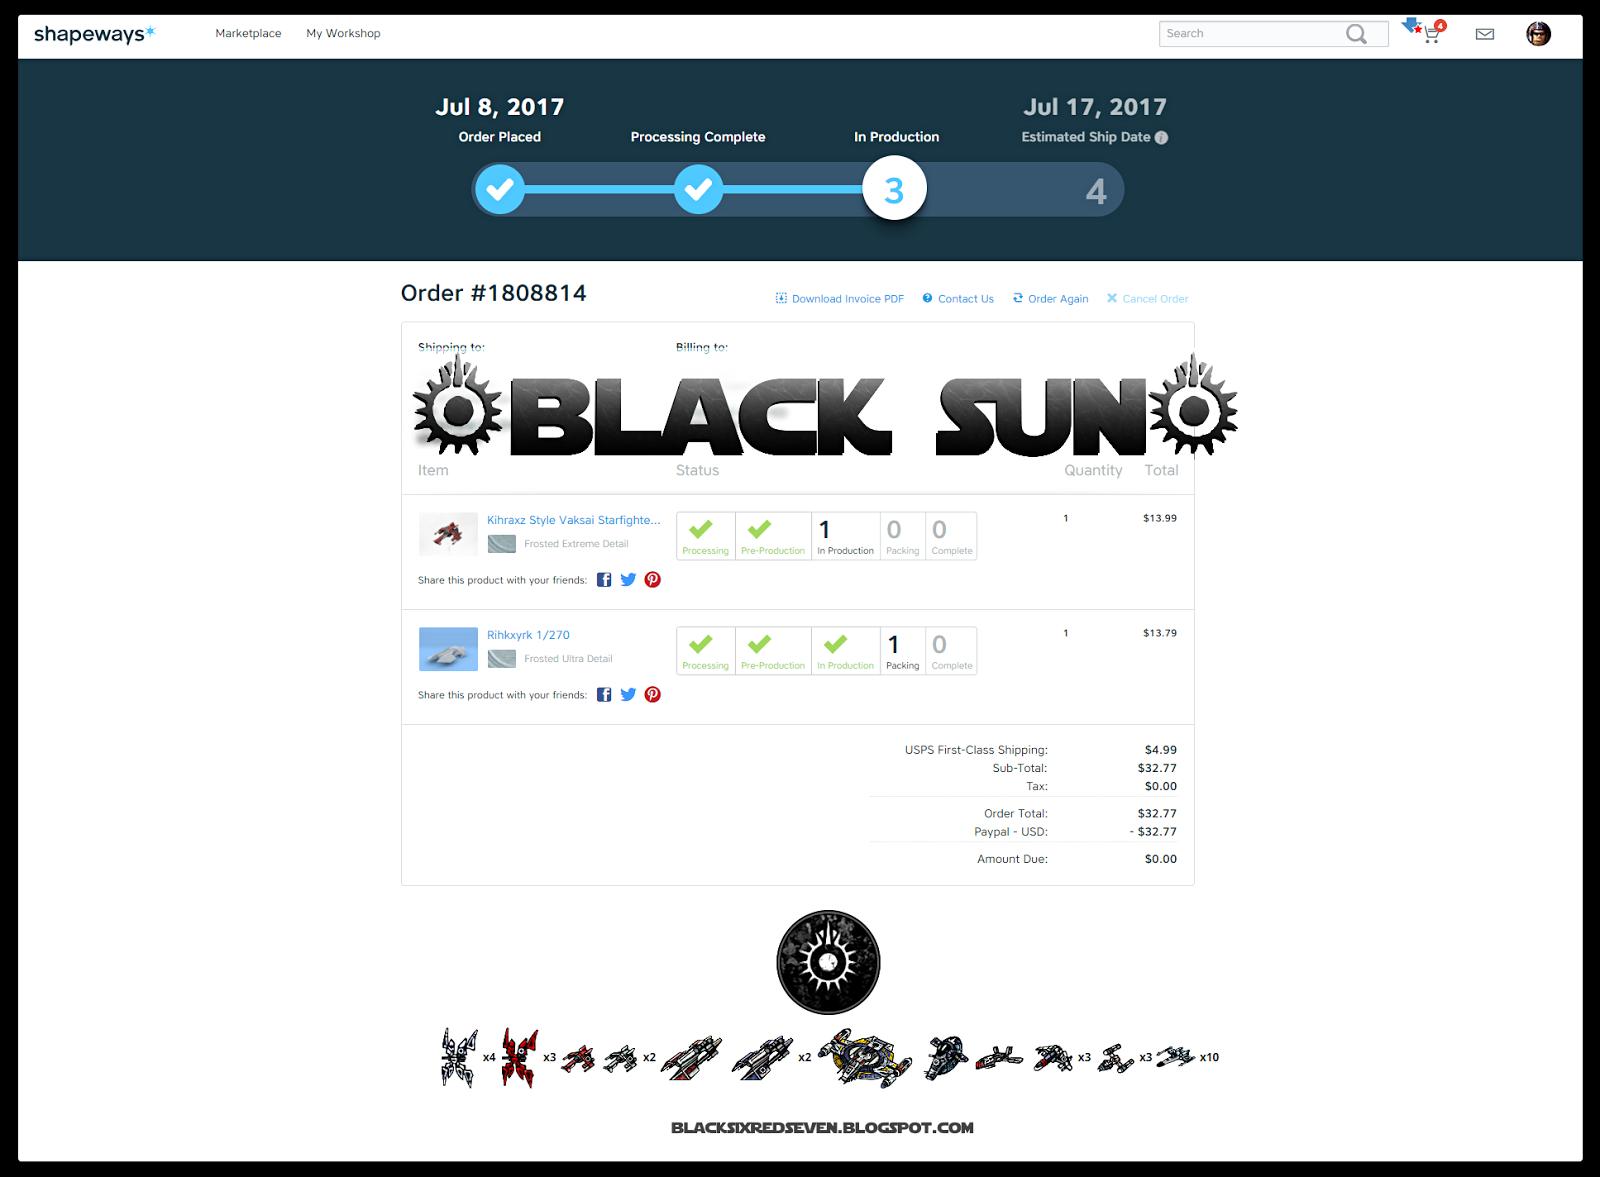 BLACK%2BSUN%2BFLEET%2B2017.PNG